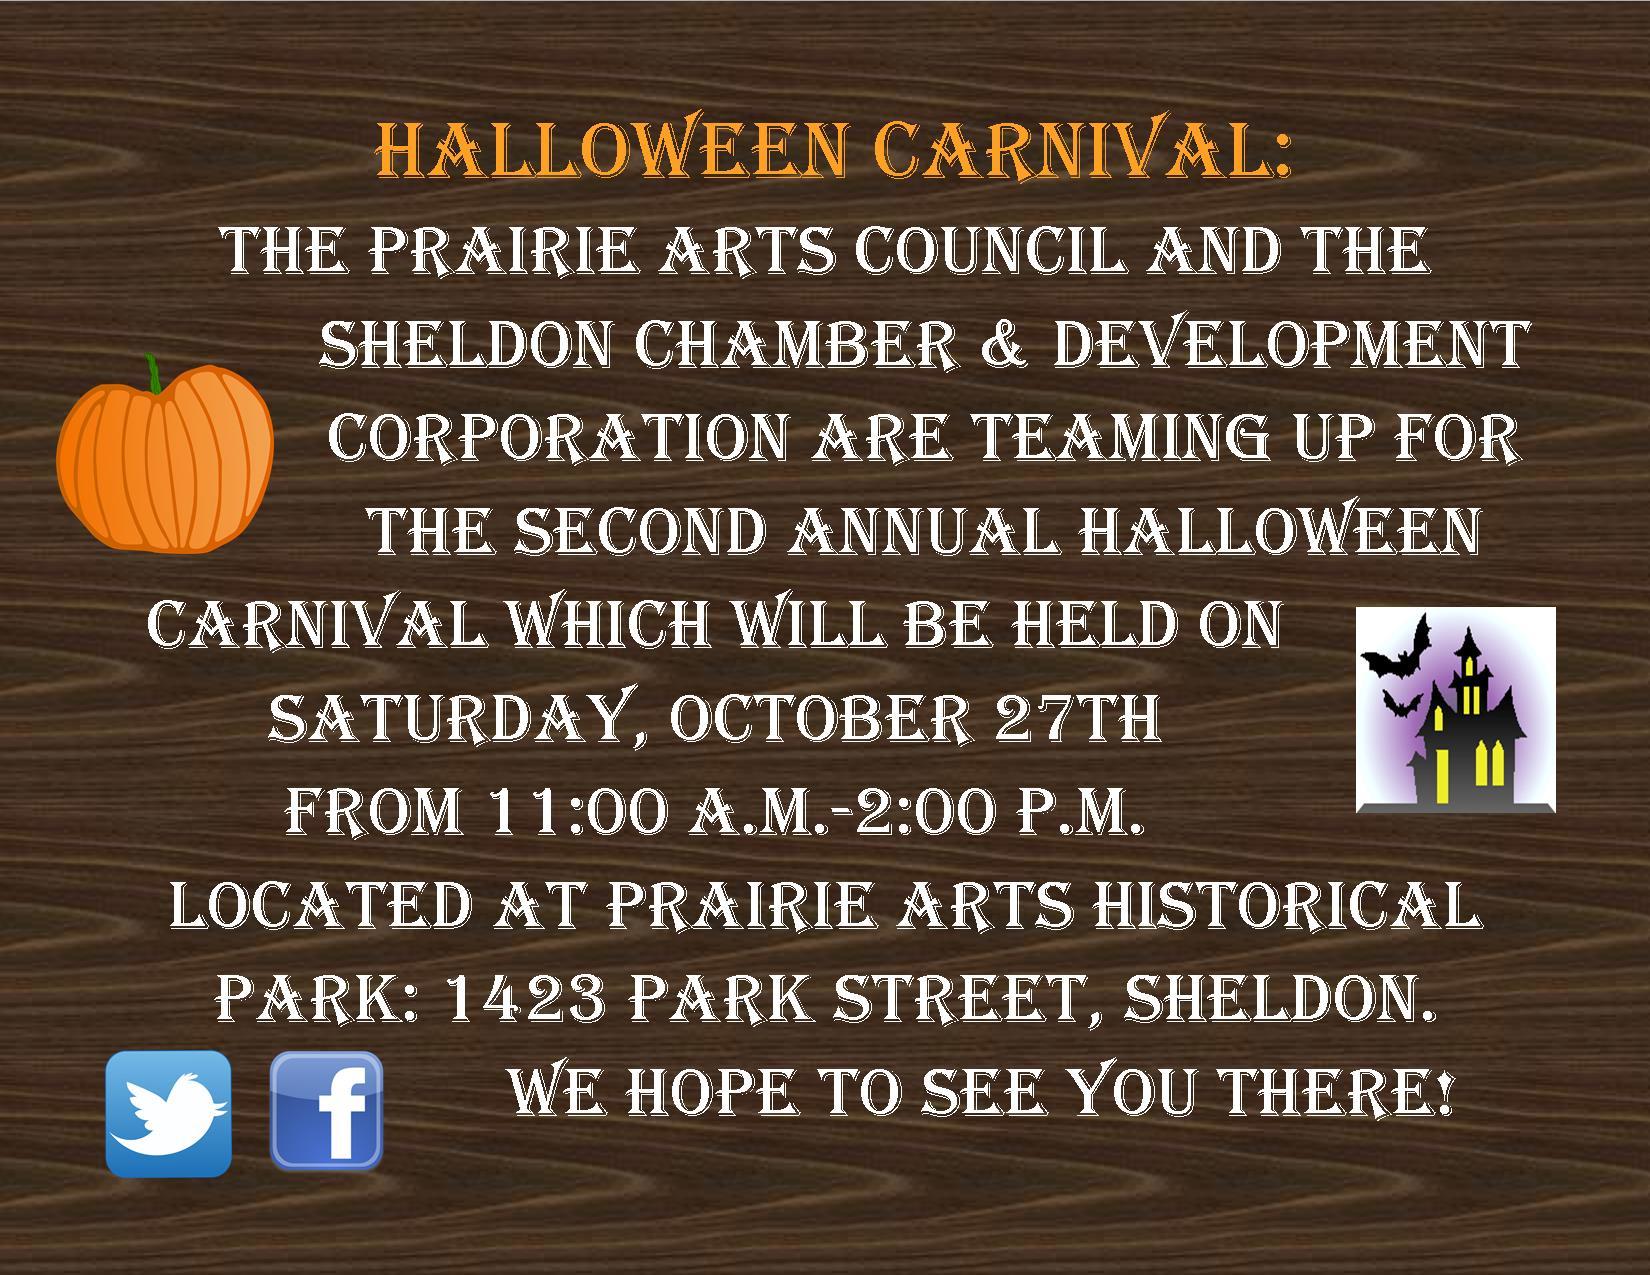 2018 Annual Halloween Carnival